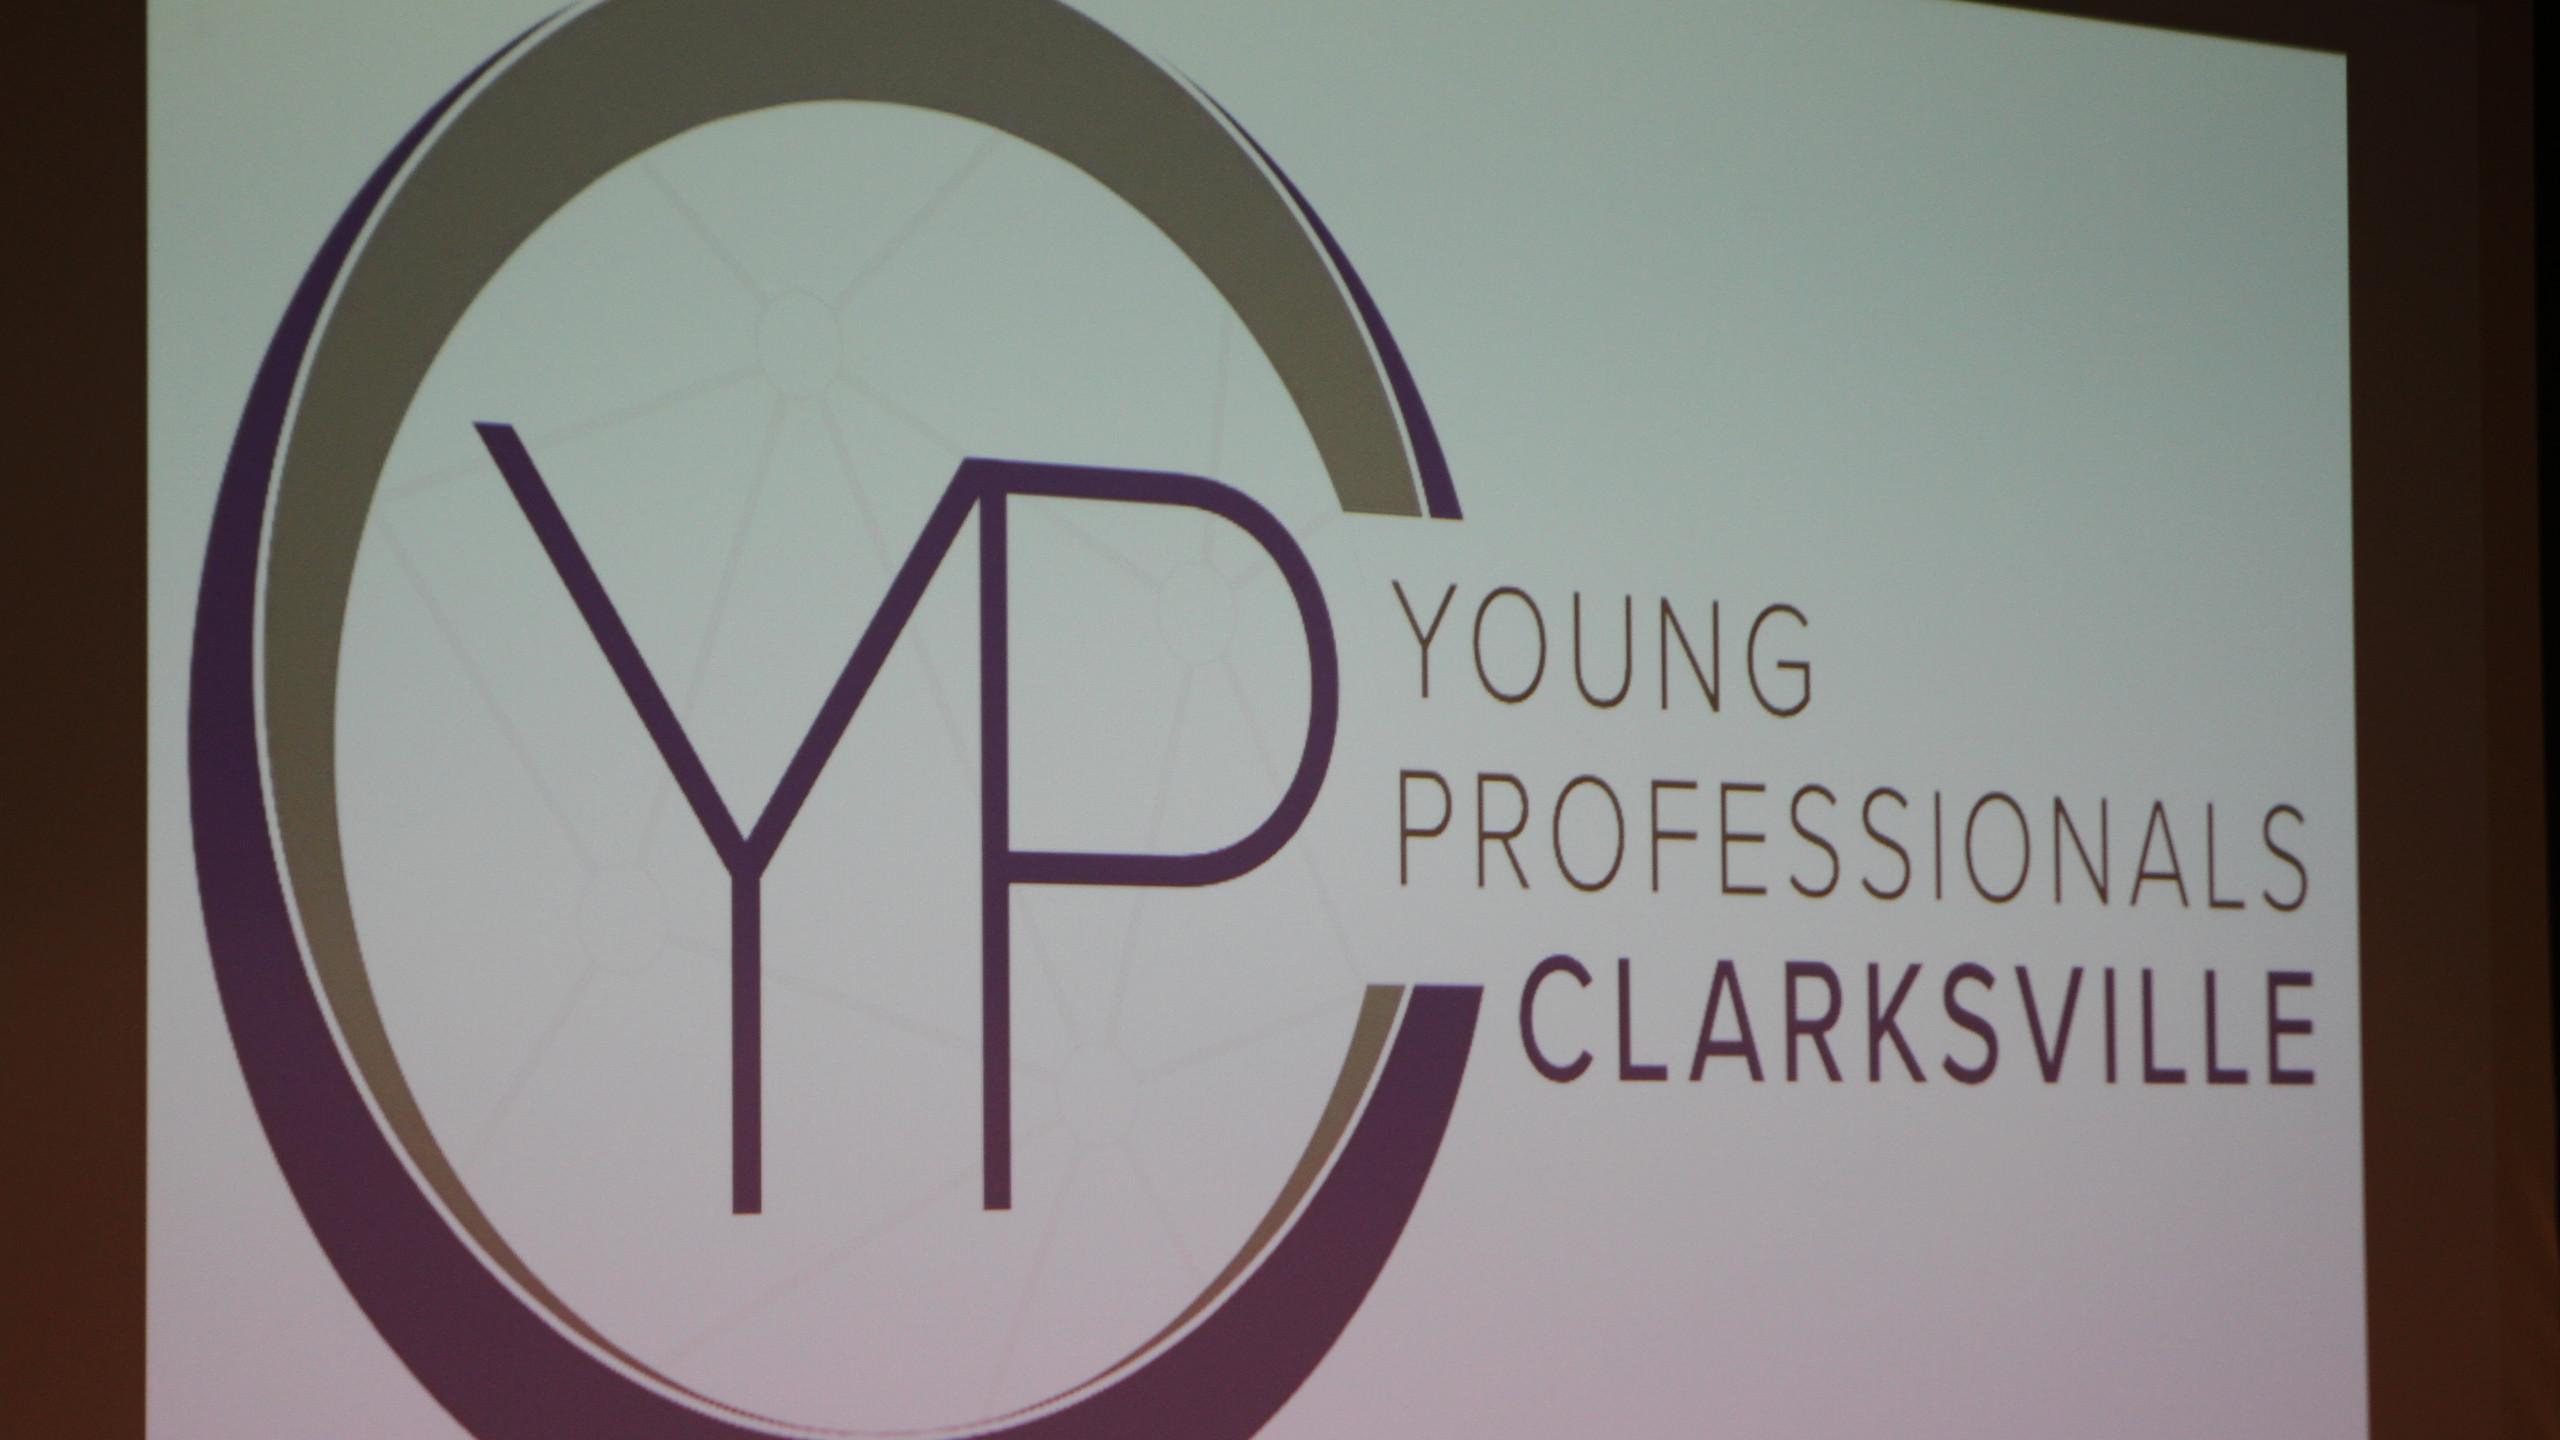 J.C. Matthews unveiled CYP's new logo